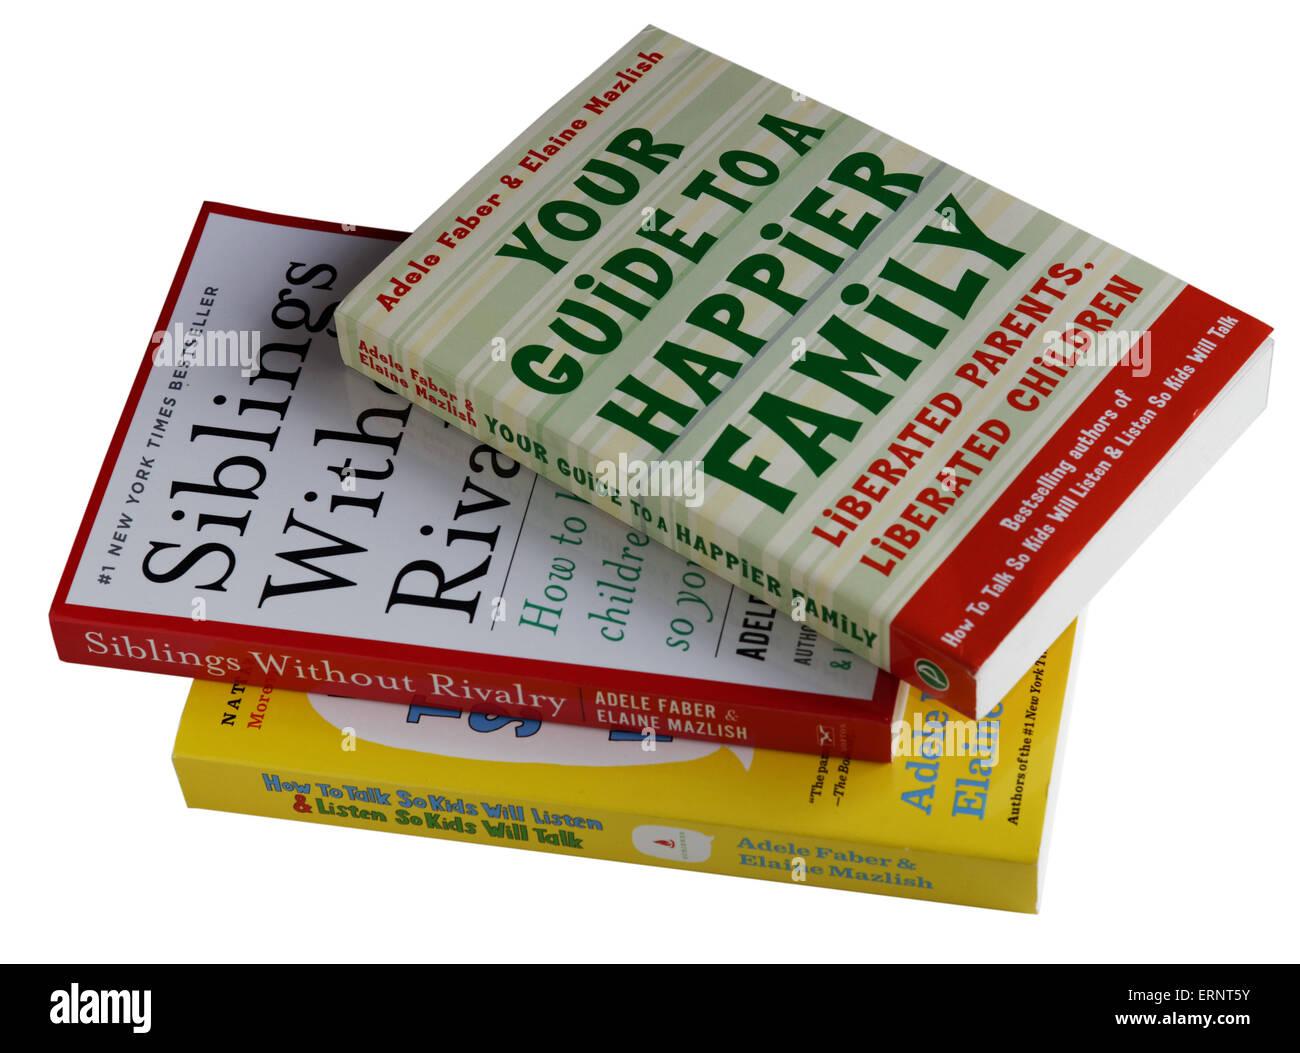 Three parenting guides by Adele Faber and Elaine Mazlish - Stock Image